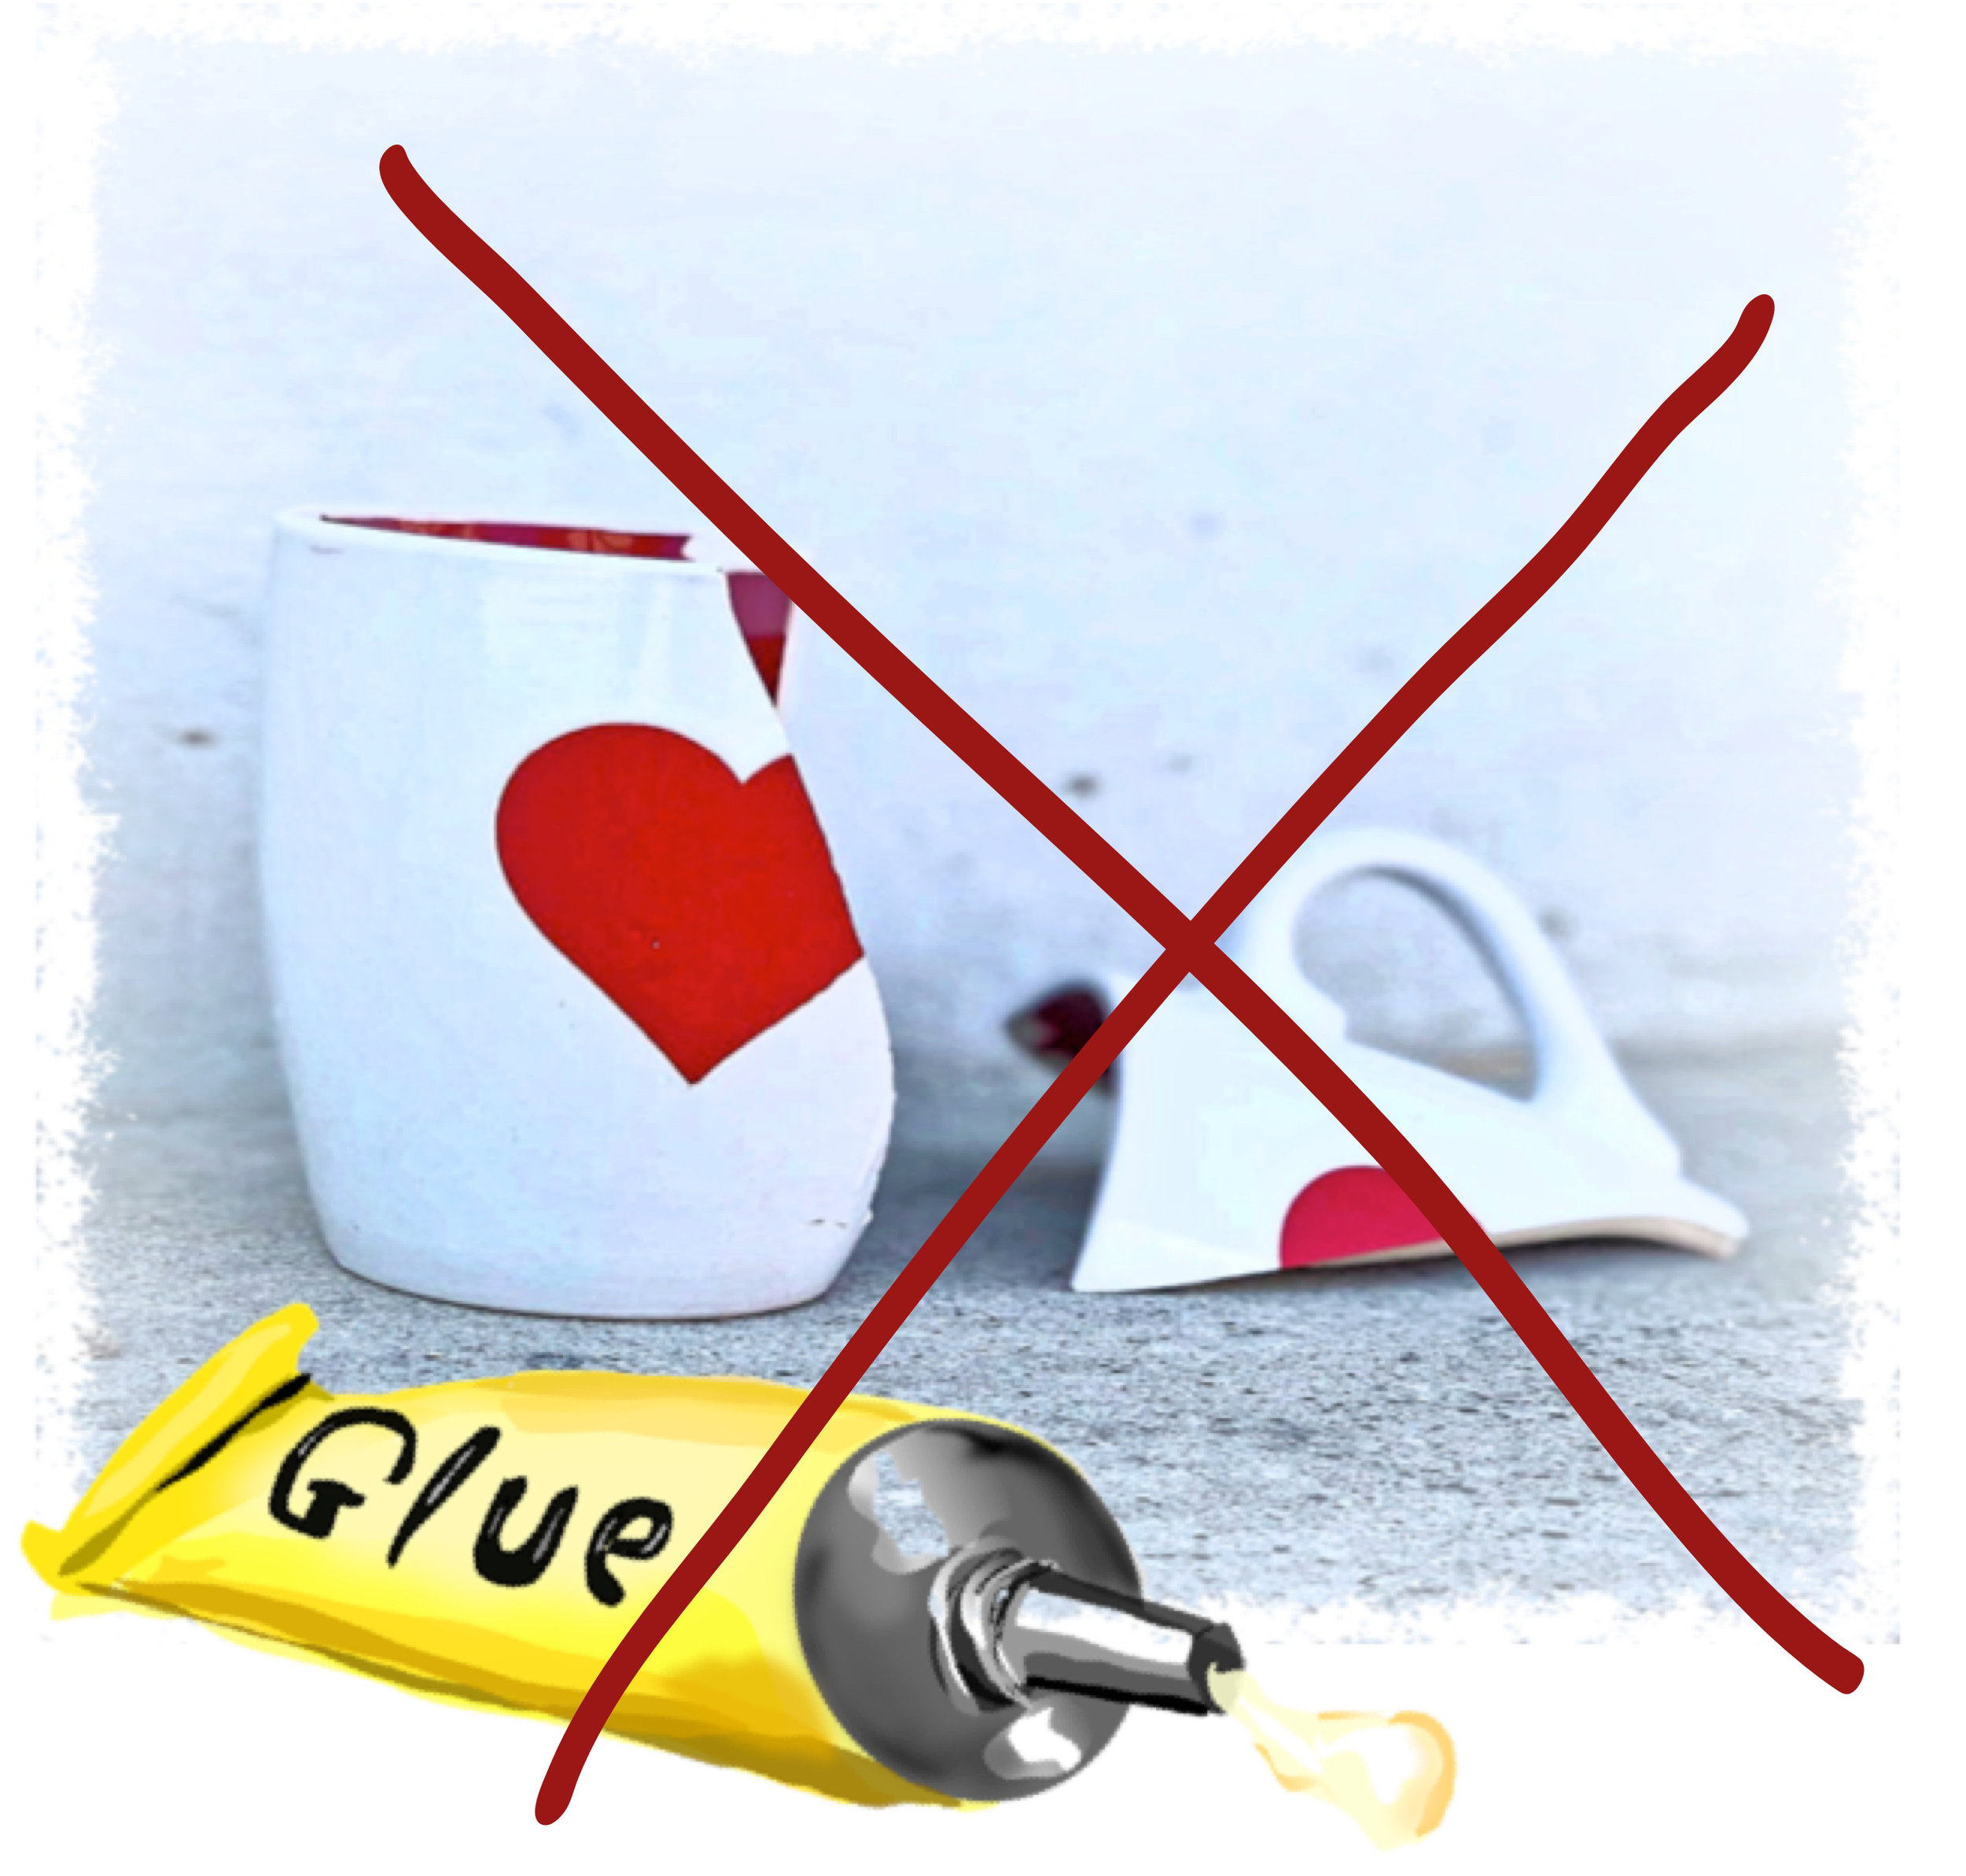 cup&glue NO.jpg